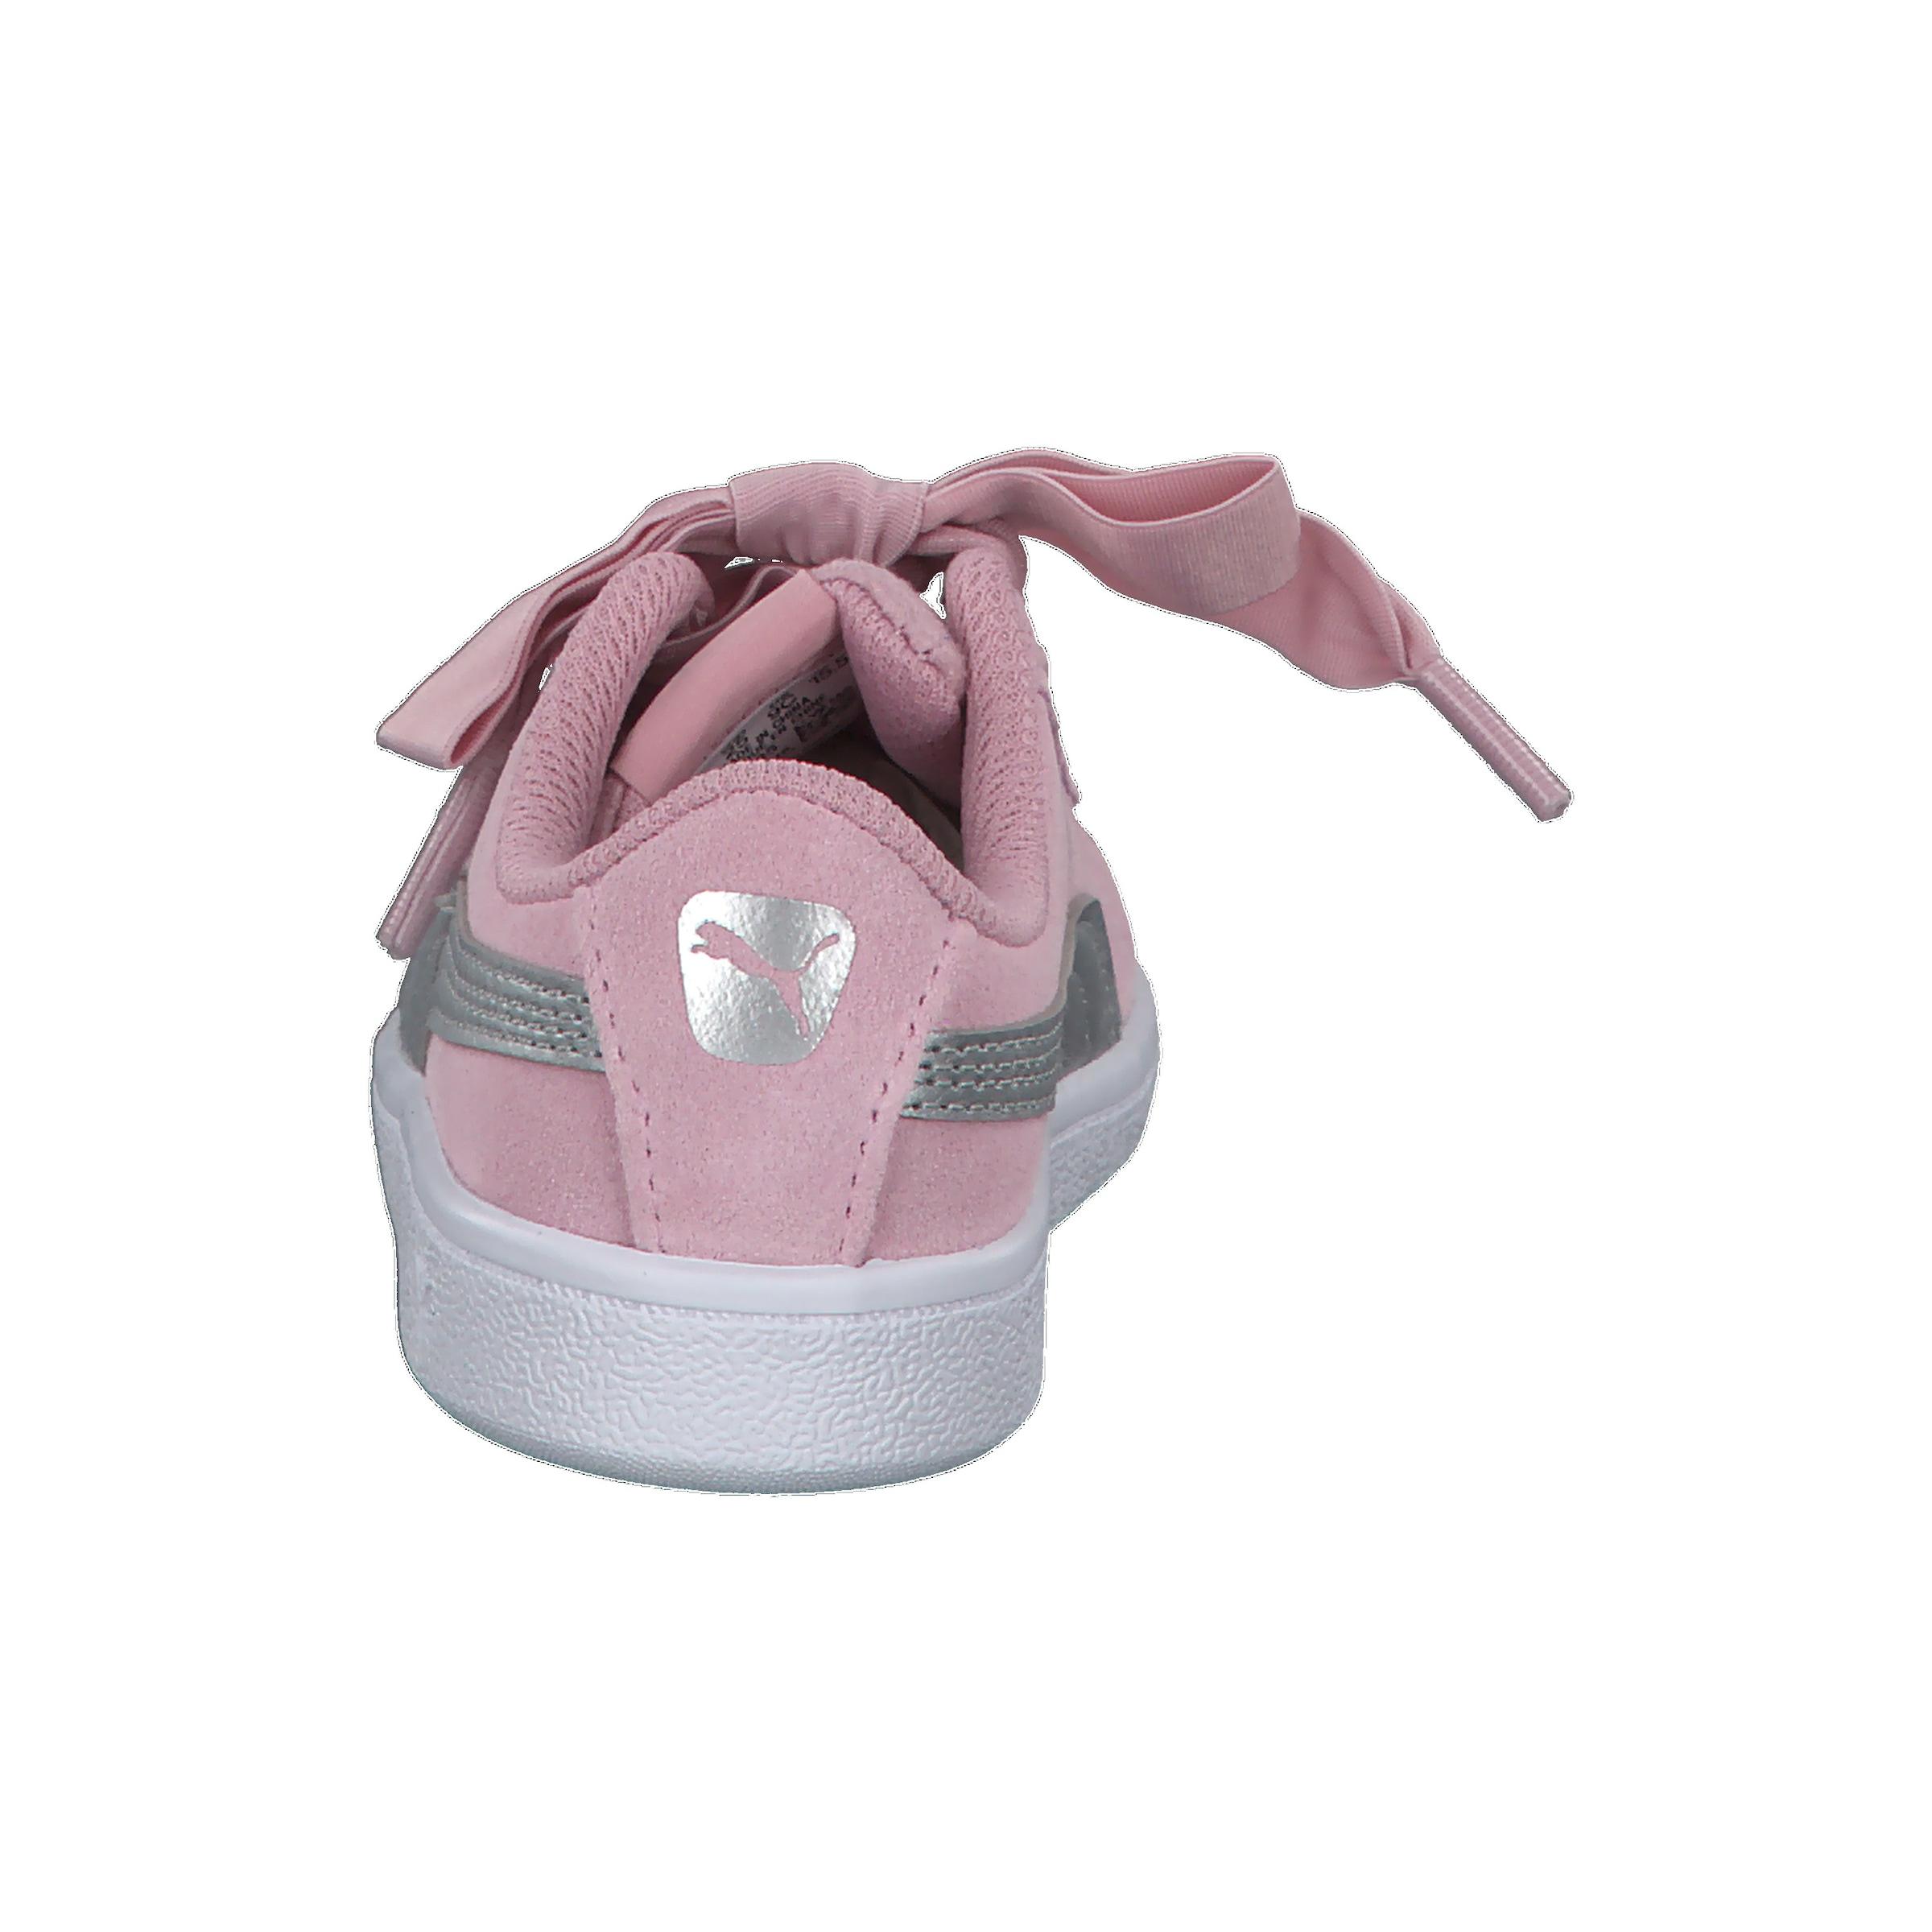 Ac' In Ribbon Puma Sneaker 'vikky PinkSilber y0vnwON8m